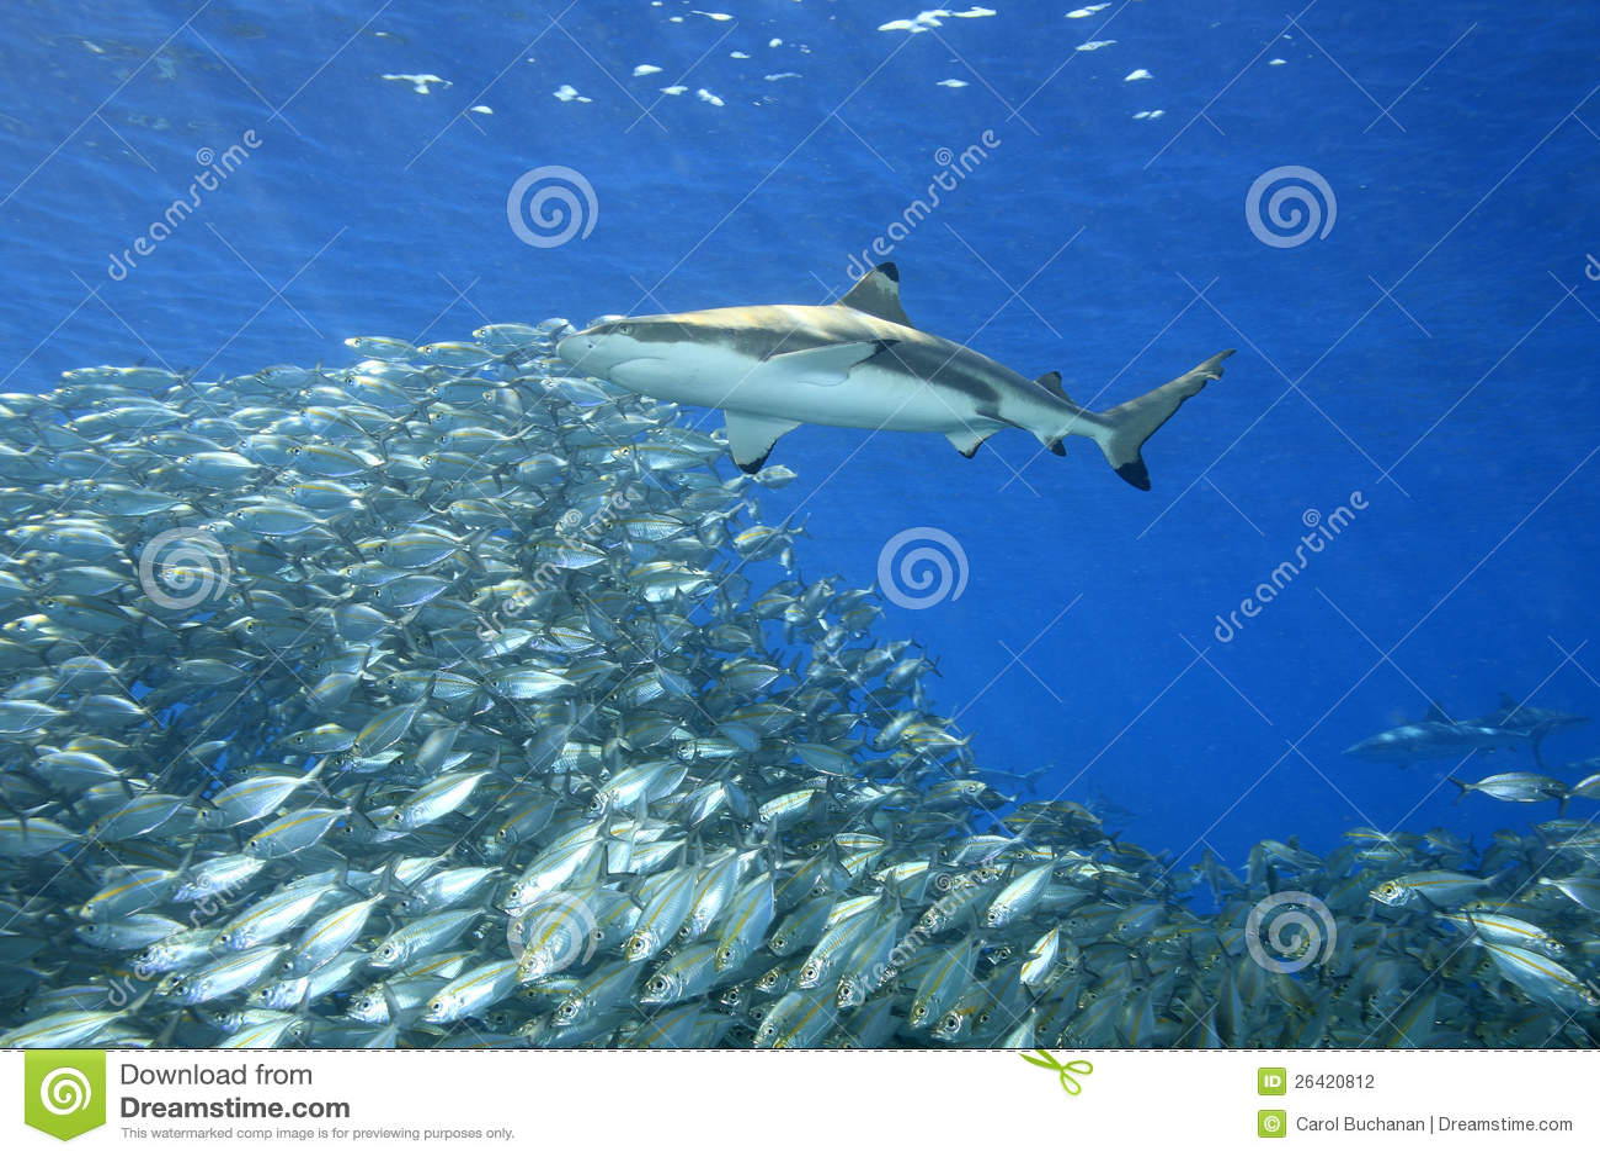 Blacktip Reef Shark with Fish